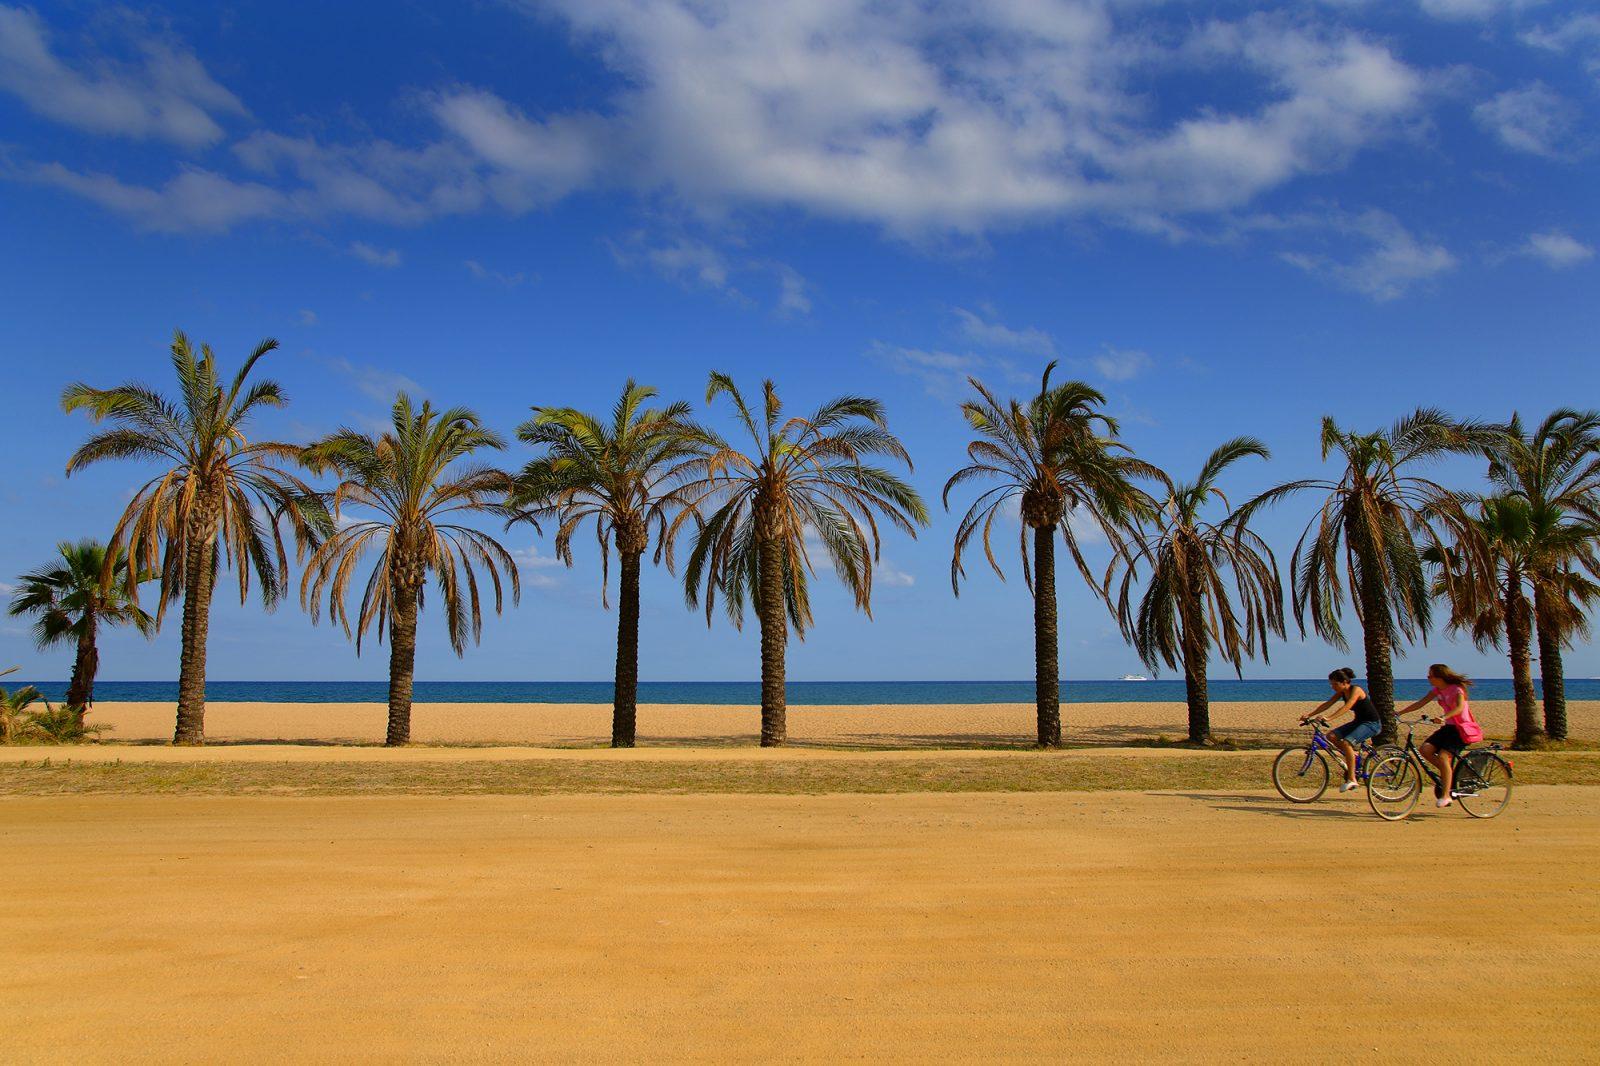 Santa-Susana---Costa-Barclona,-Maresme-©-Lluís-Carro